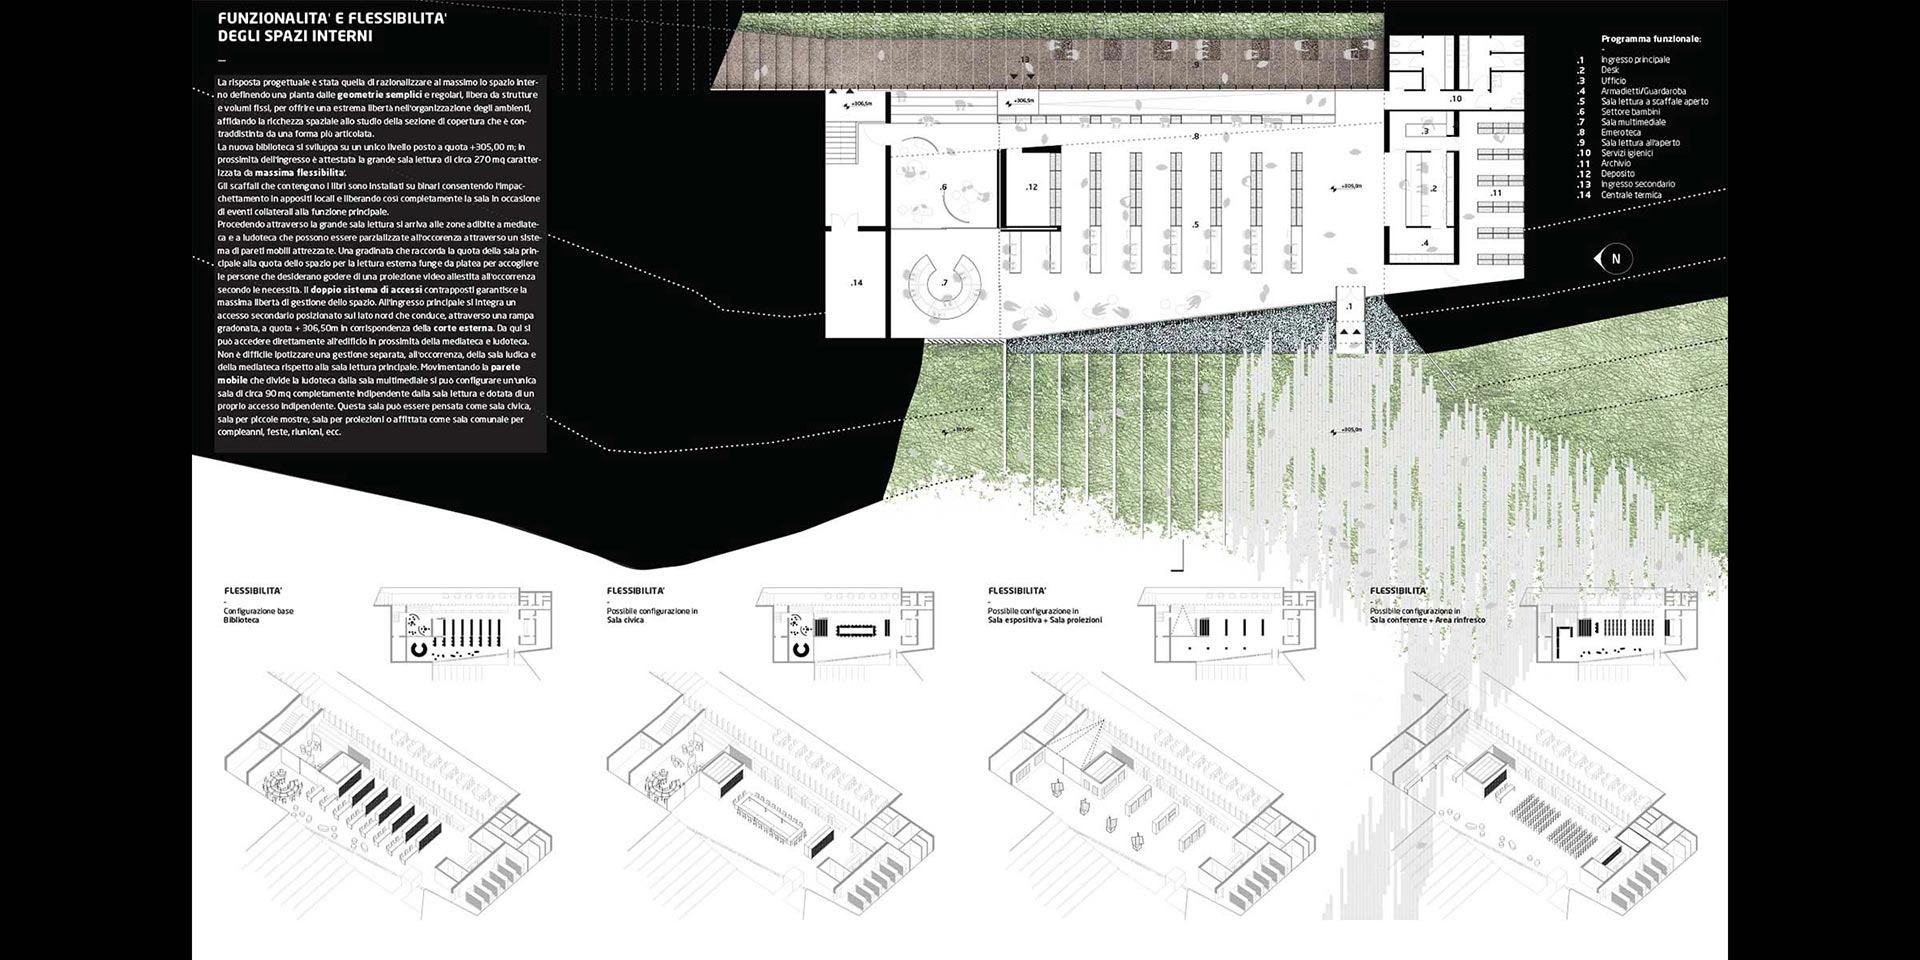 archinow_BRI_biblioteca-comunale-briosco_02